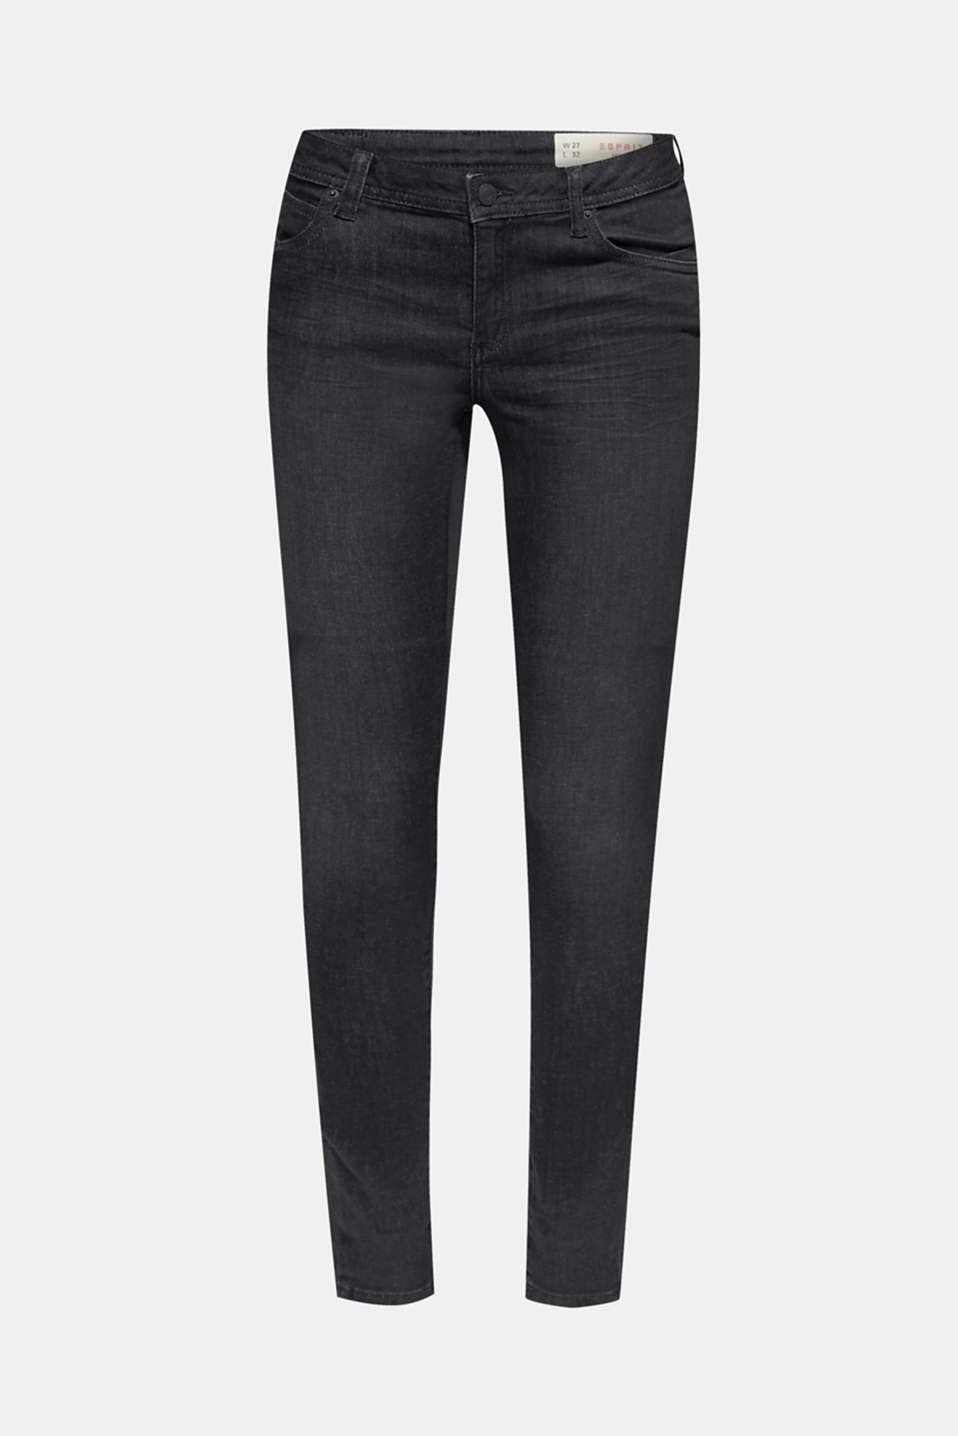 Pants denim, BLACK DARK WASH, detail image number 6